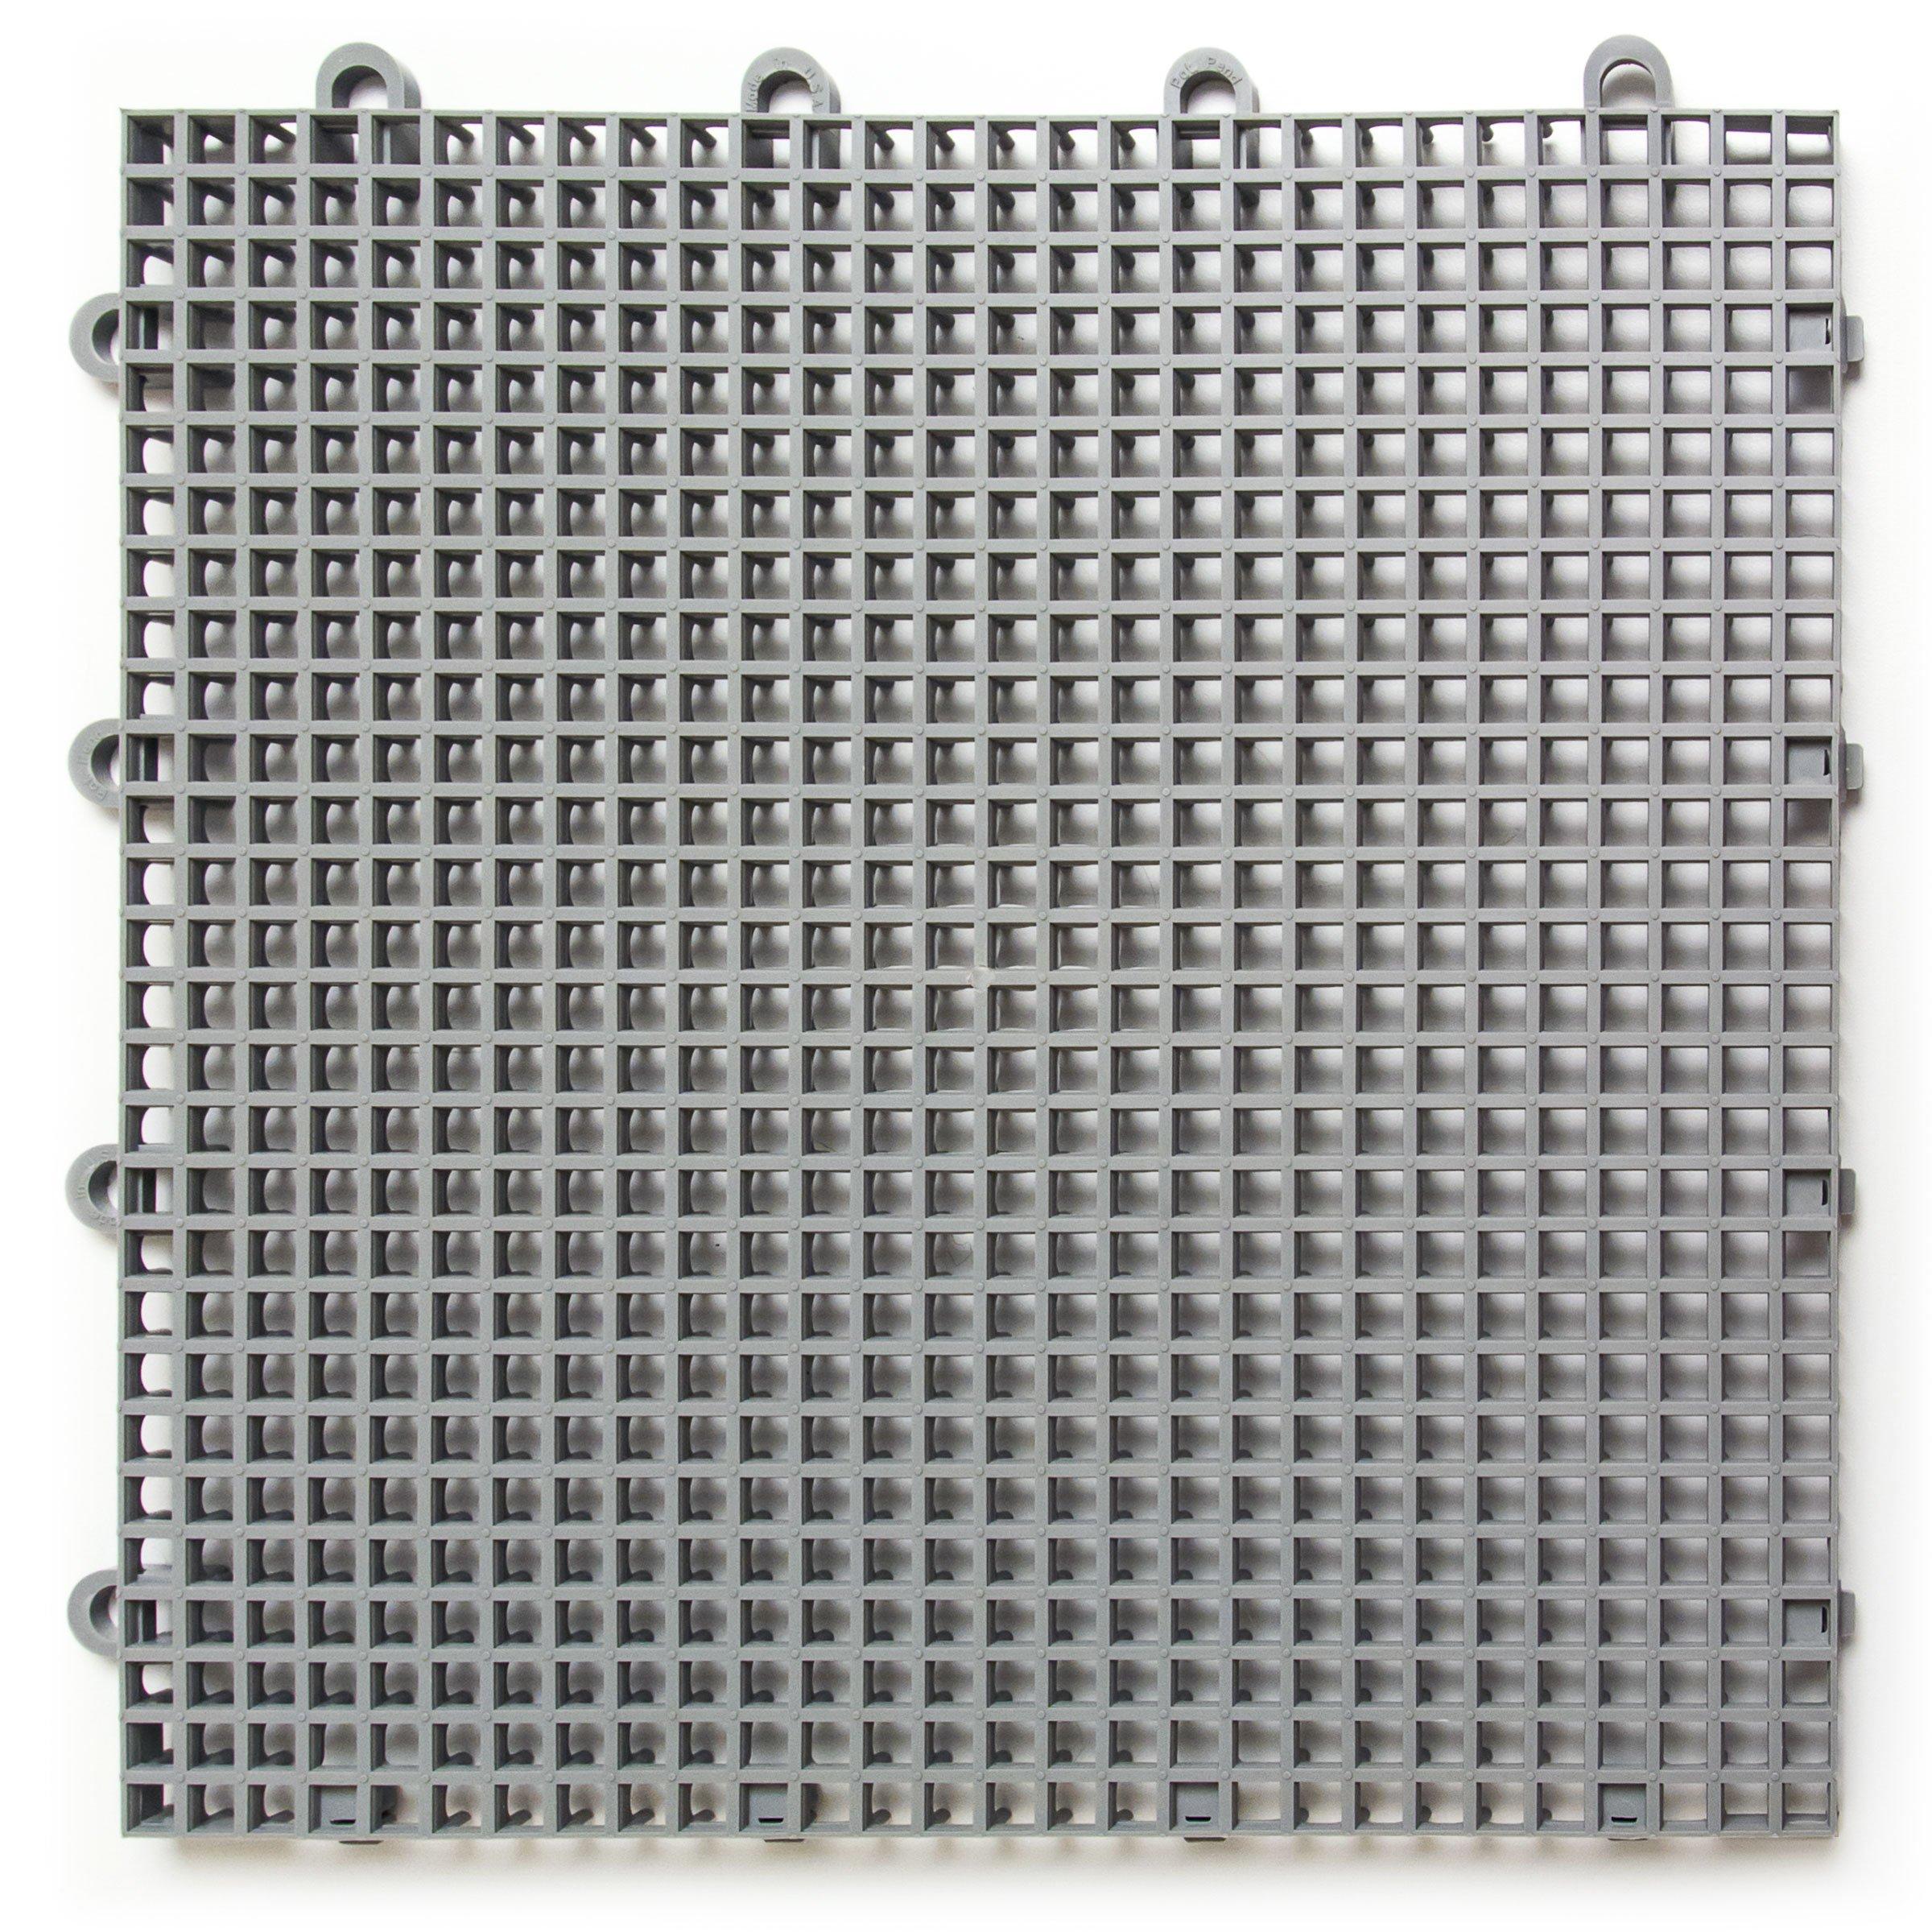 DuraGrid ST24GRAY Comfort Tile Interlocking Modular Multi-Use Safety Floor Matting (24 Pack), Gray, Piece by DuraGrid® (Image #1)